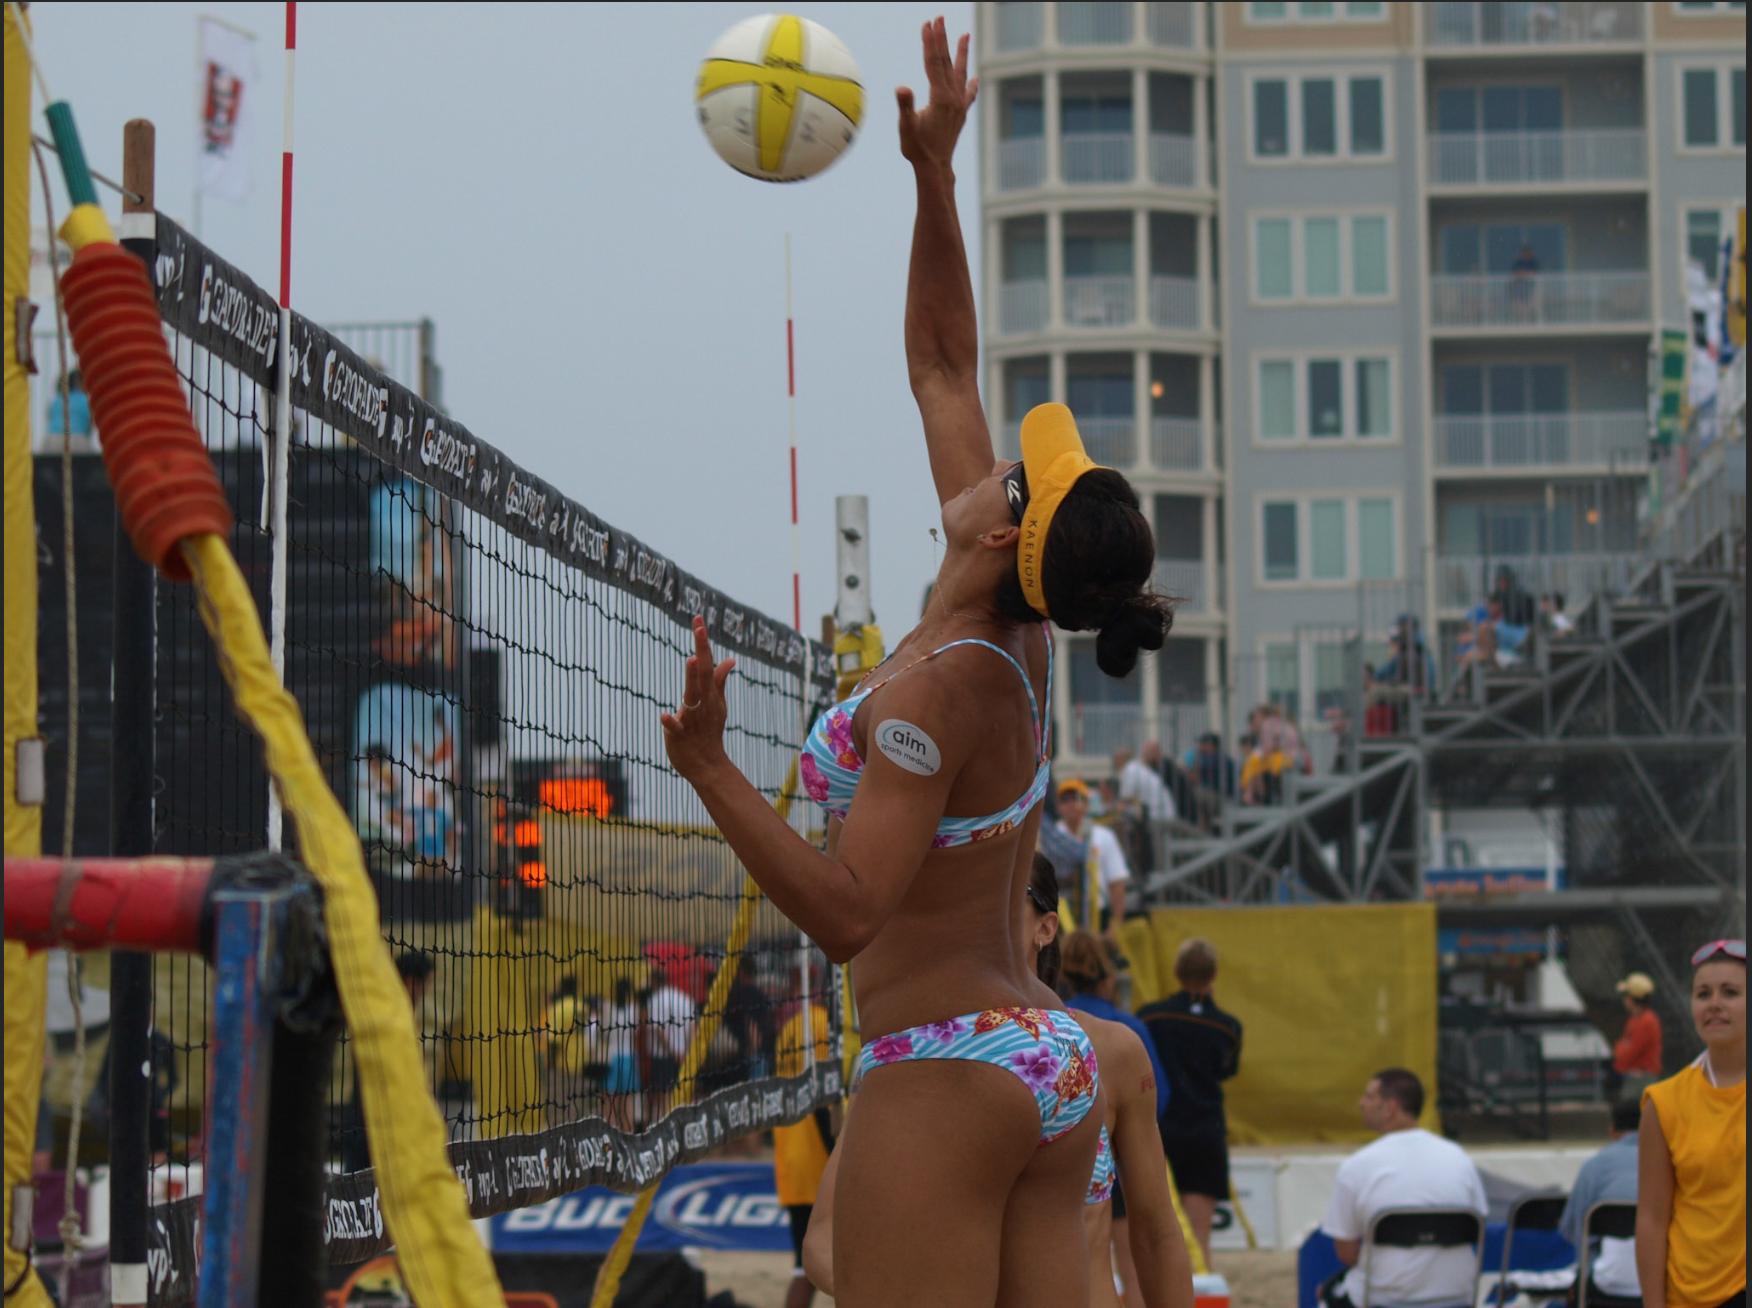 Tyra Turner, AVP Pro, hitting during an event.